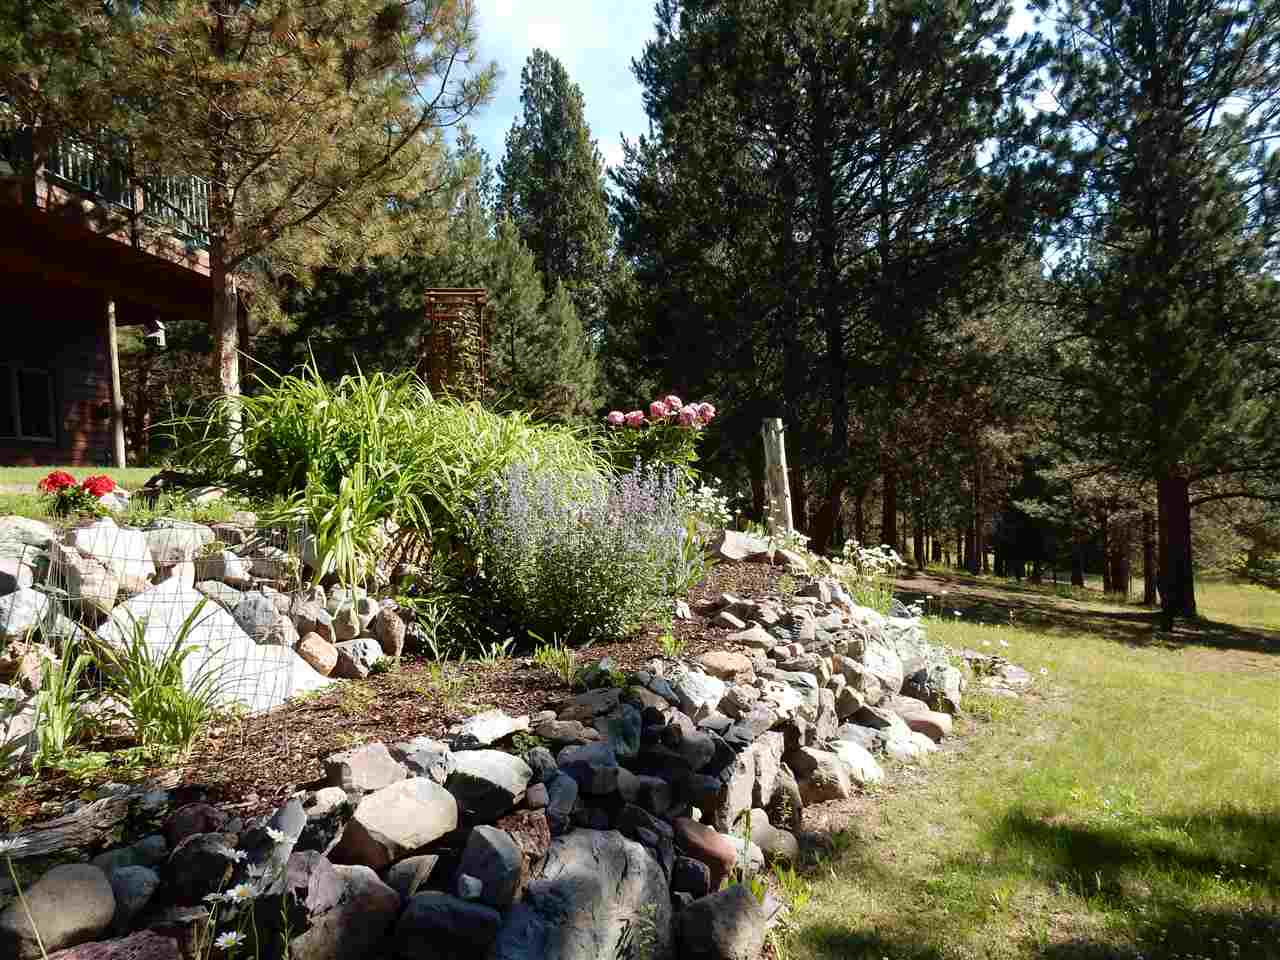 https://s3-us-west-2.amazonaws.com/cevado.idx1/helena/helena/295403/3757-stonewall-creek-rd-lincoln-59639-f047b606_17.jpg